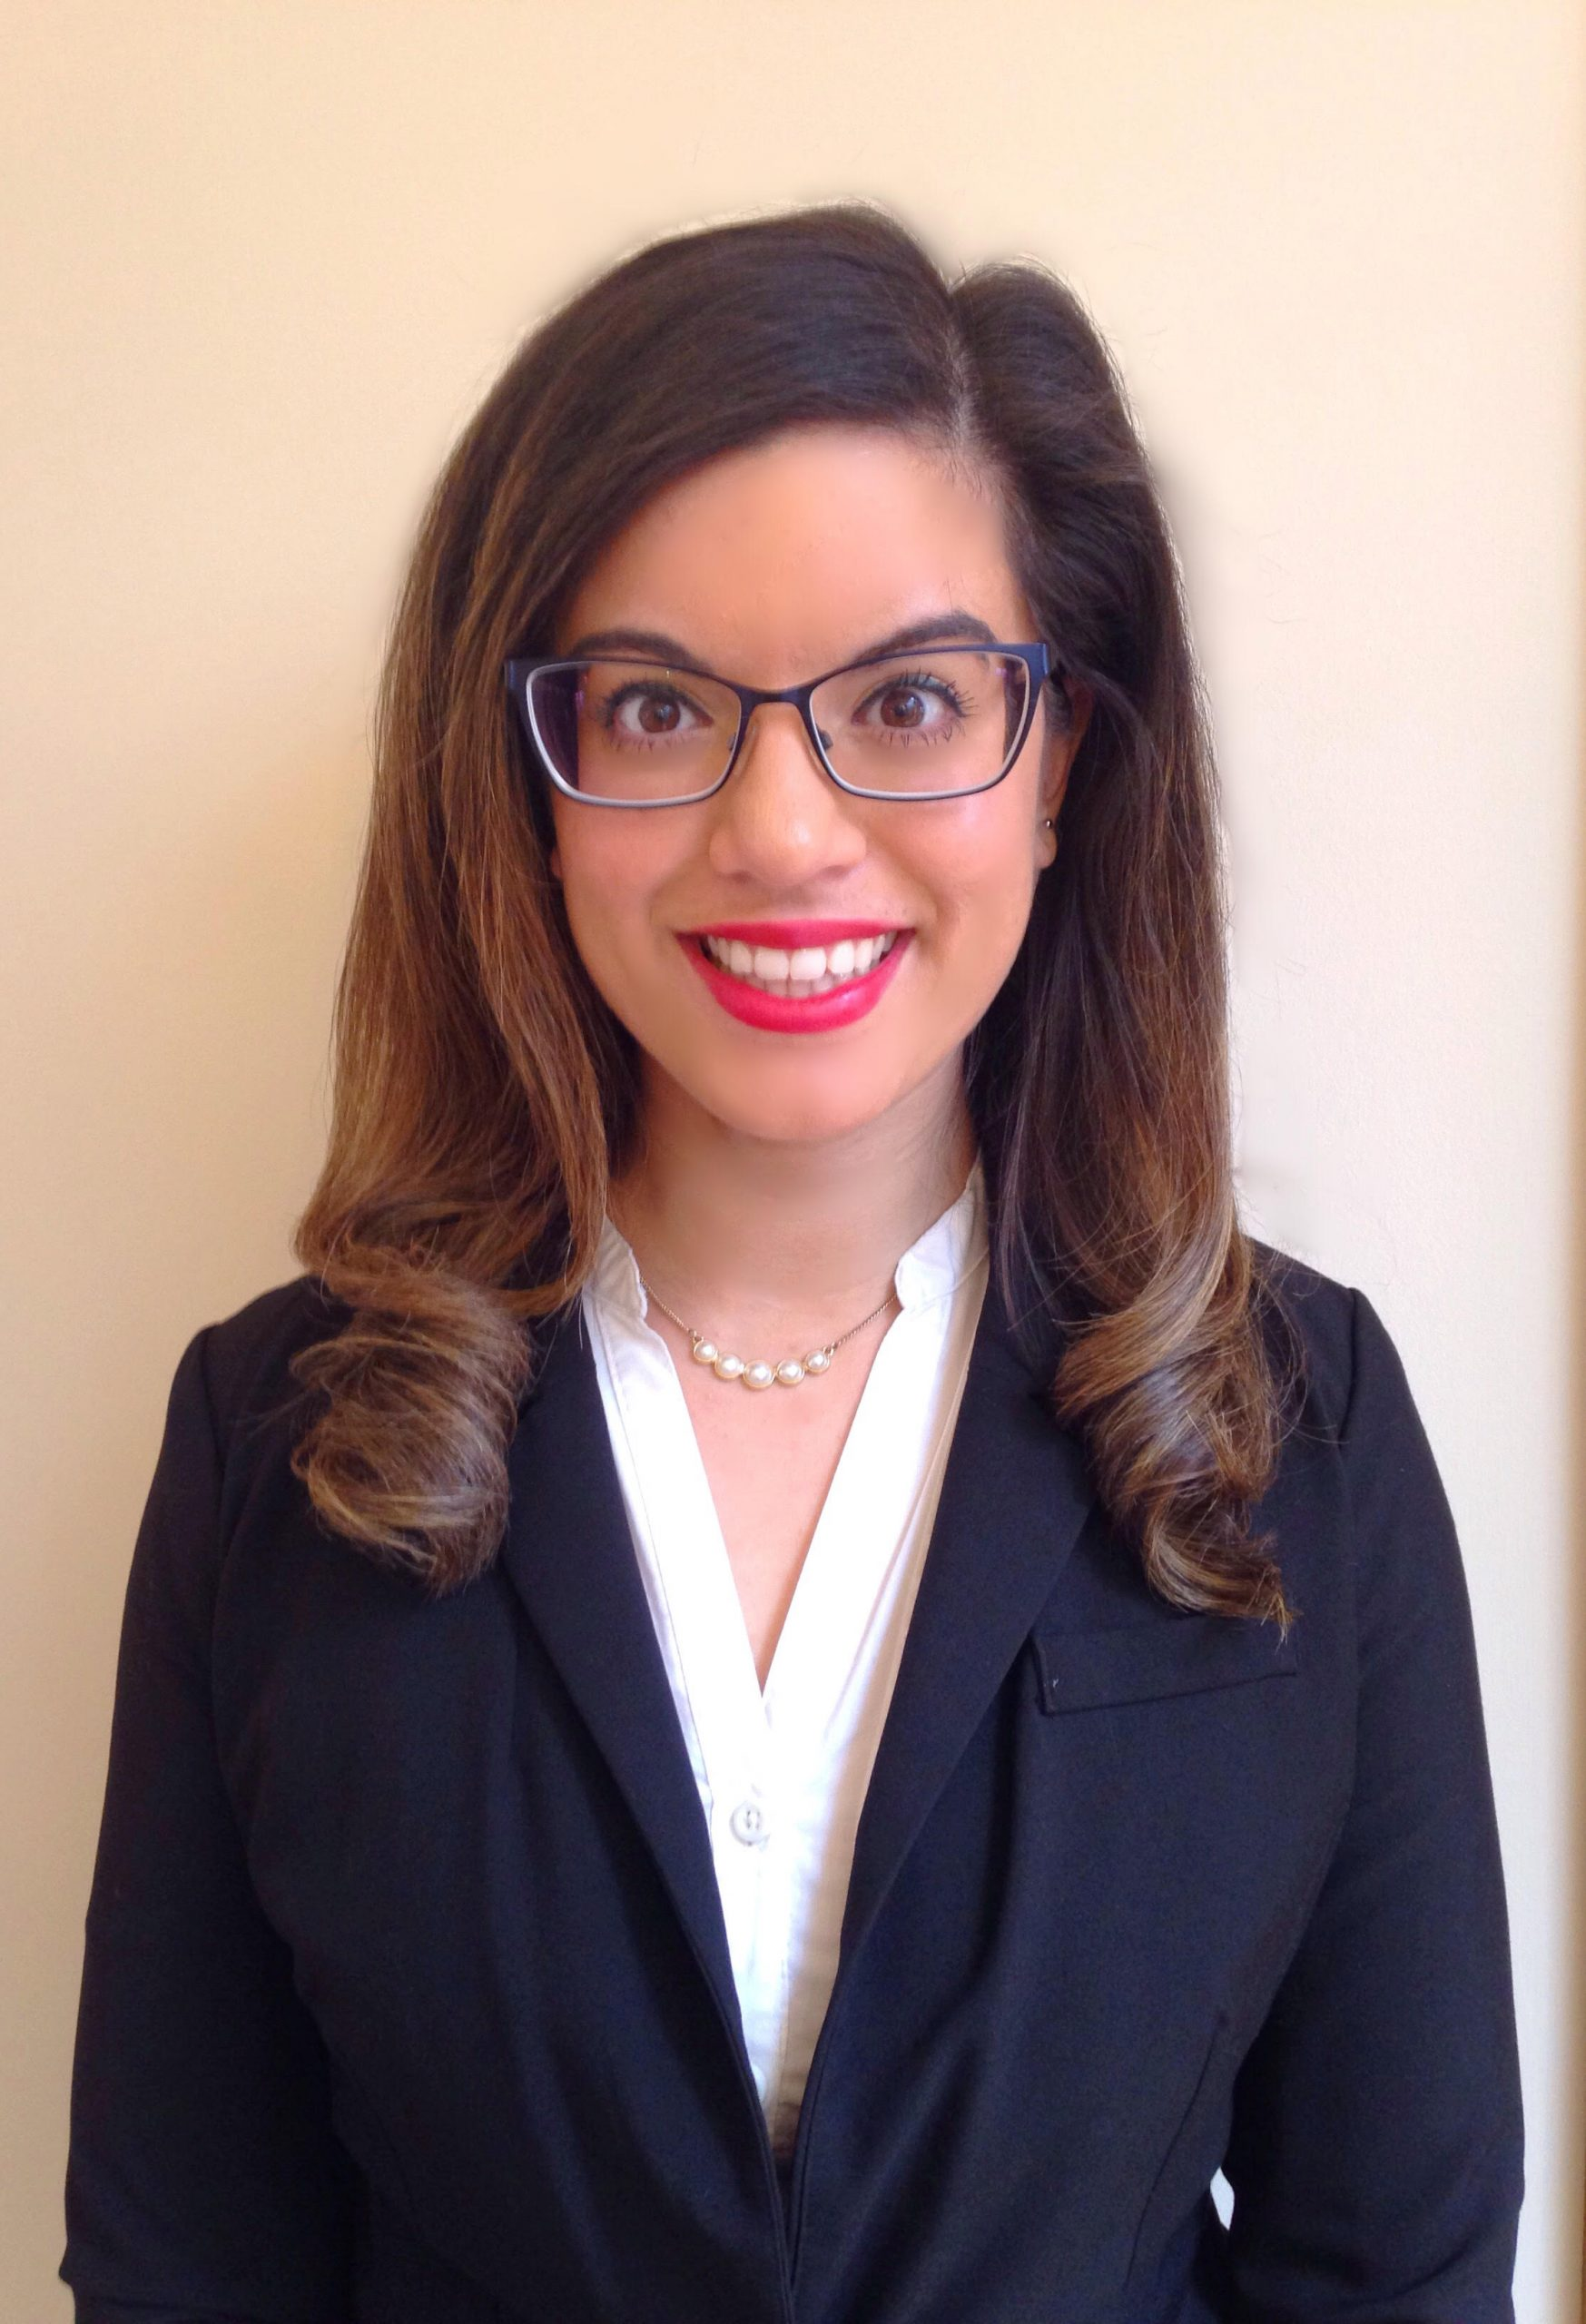 Ms. Polsinelli | Business Teacher